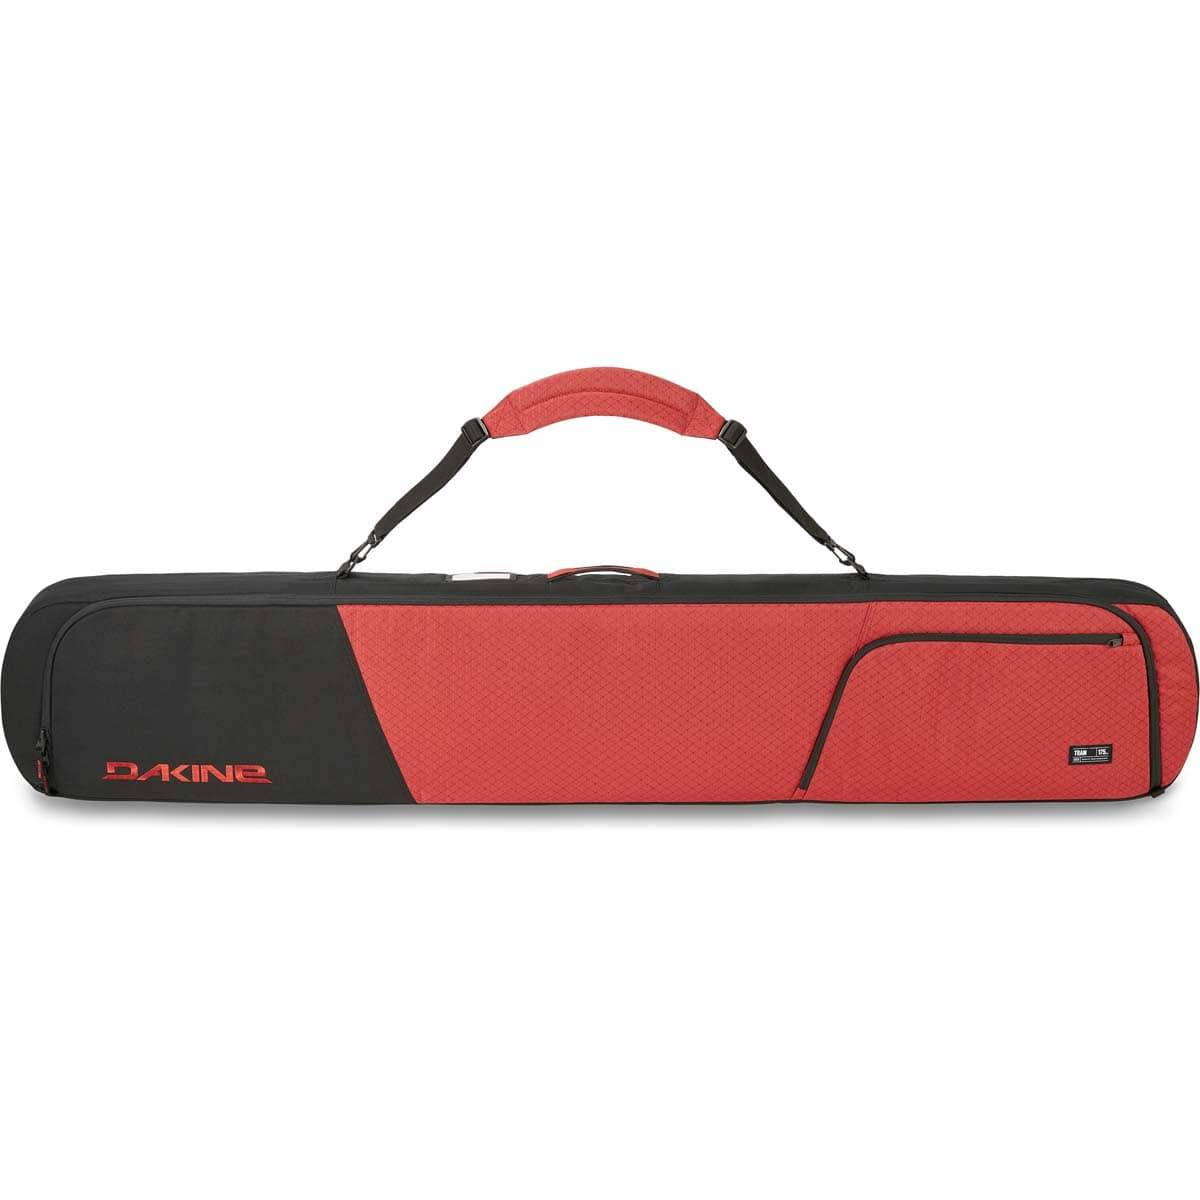 Dakine Tram Ski Bag 190 cm Sci Borsa Tandoori Spice